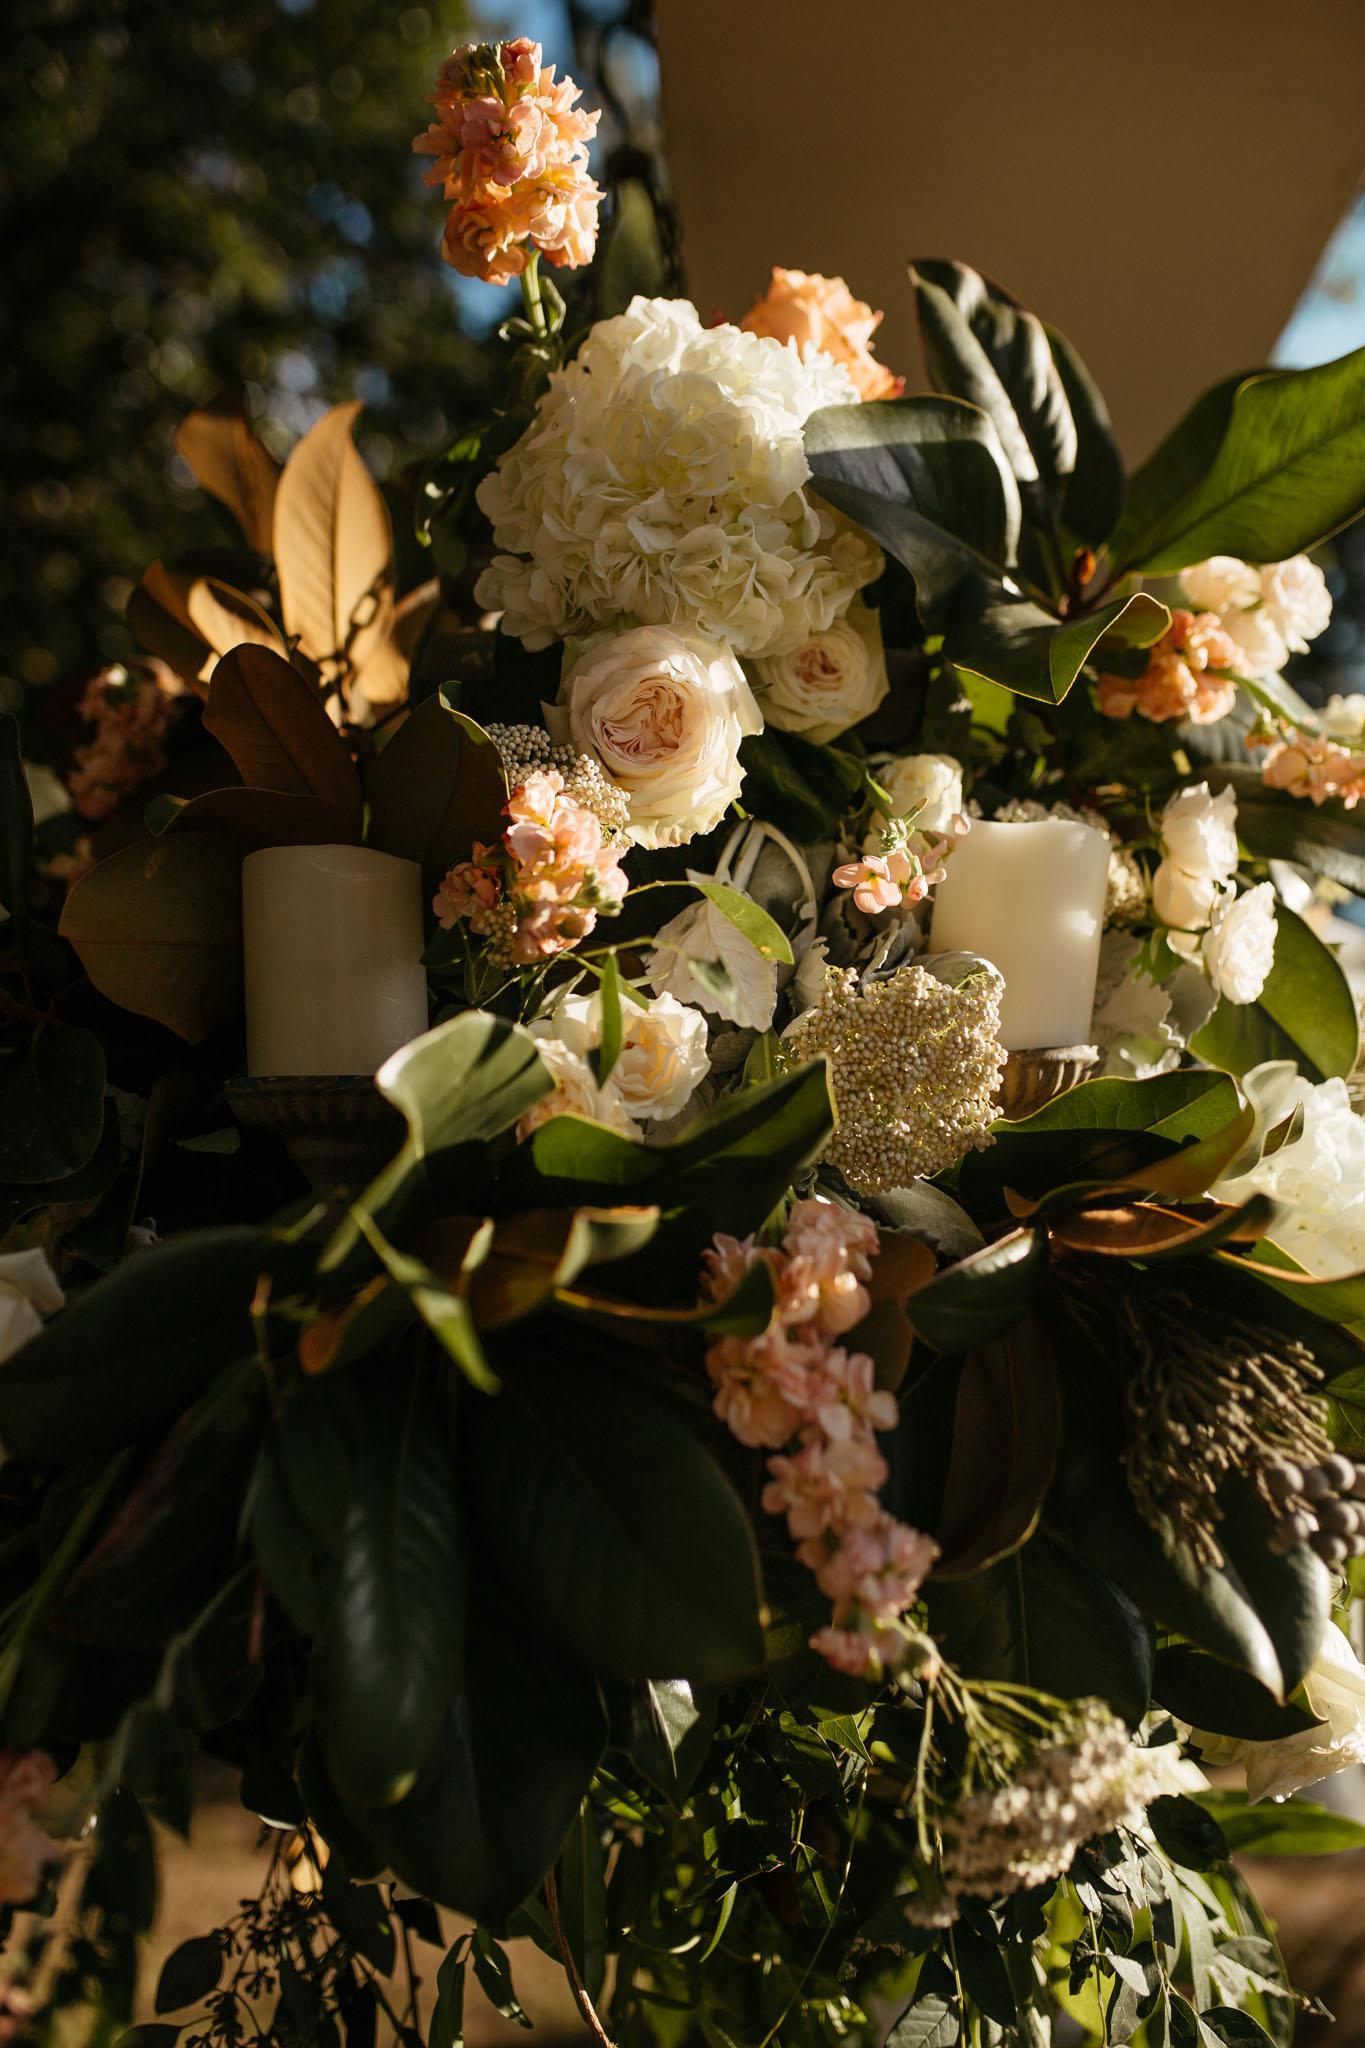 The Hatches   An Elegant Garden Wedding   Cedar Hall   Memphis Tennessee Wedding and Elopement Photographers   memphis-tennessee-utah-colorado-arizona-washington-wedding-elopement-photographer-garden-elegant-warm-summer-classic-romantic-floral-vintage